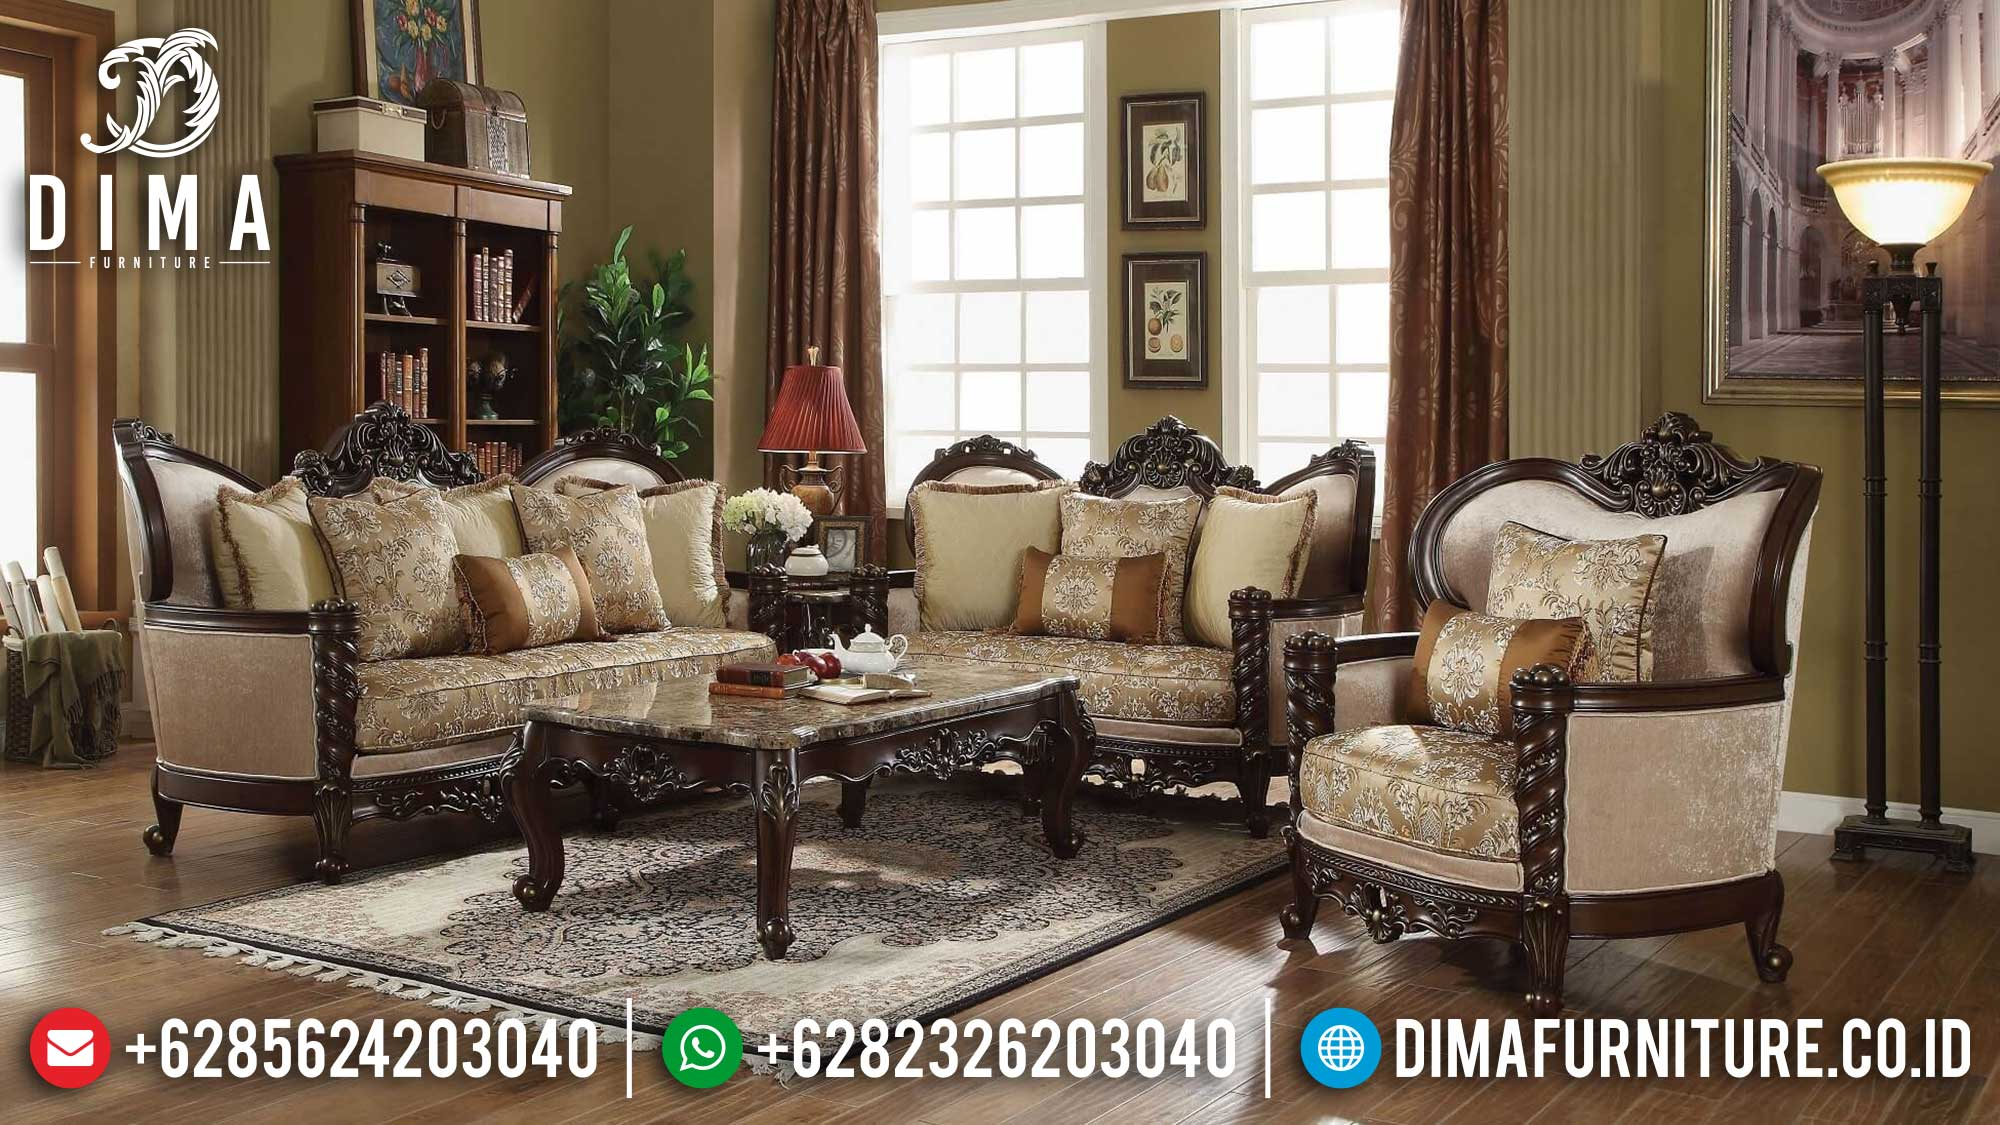 Sofa Tamu Mewah Ariana Luxury Set Premiere Design Classic TTJ-1519